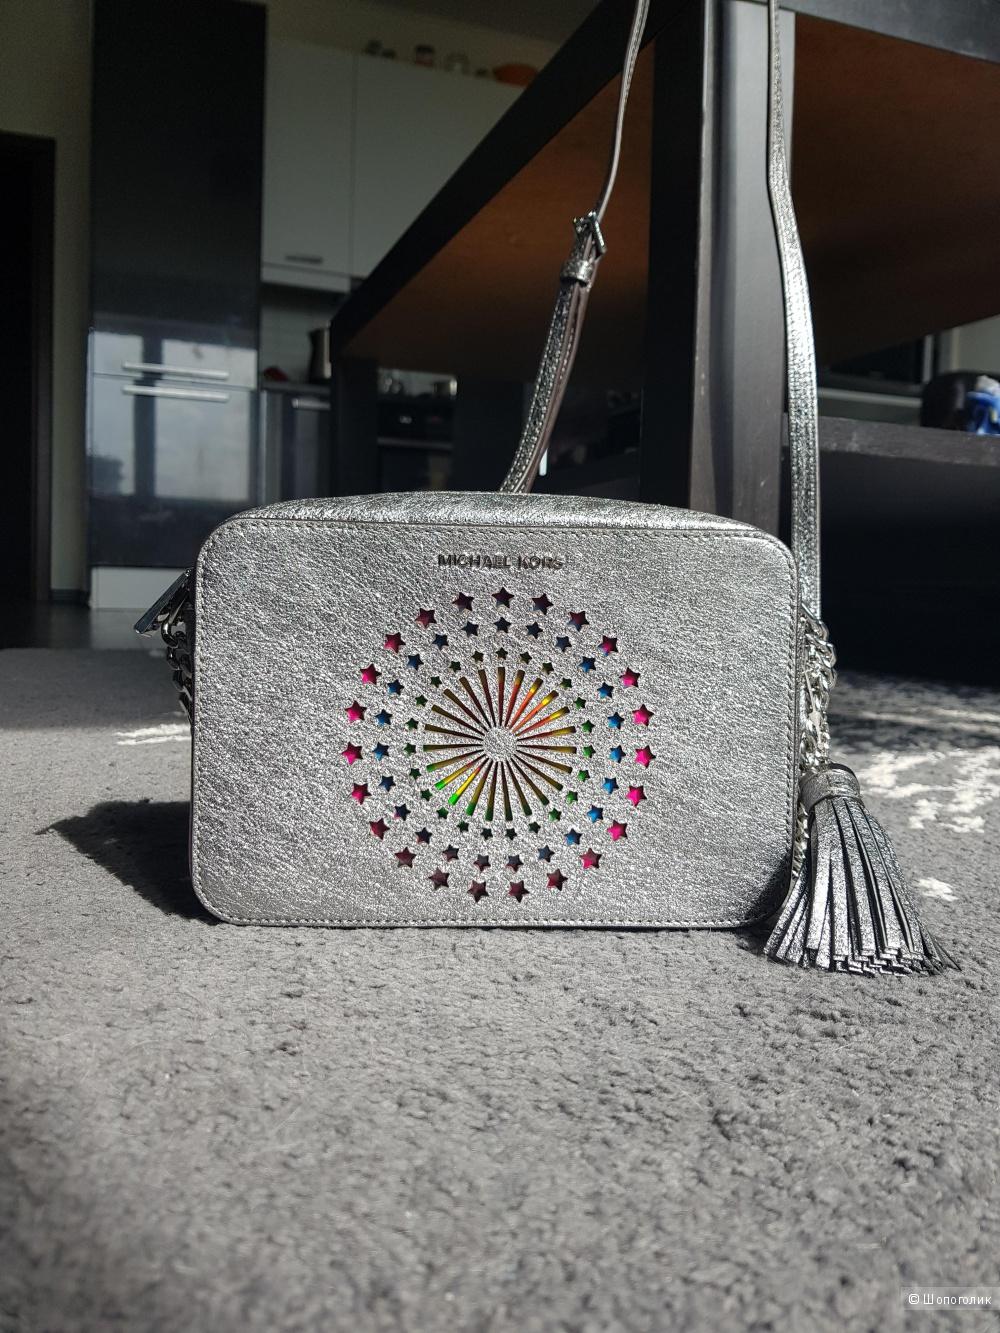 Michael Kors Ginny сумка - кроссбоди